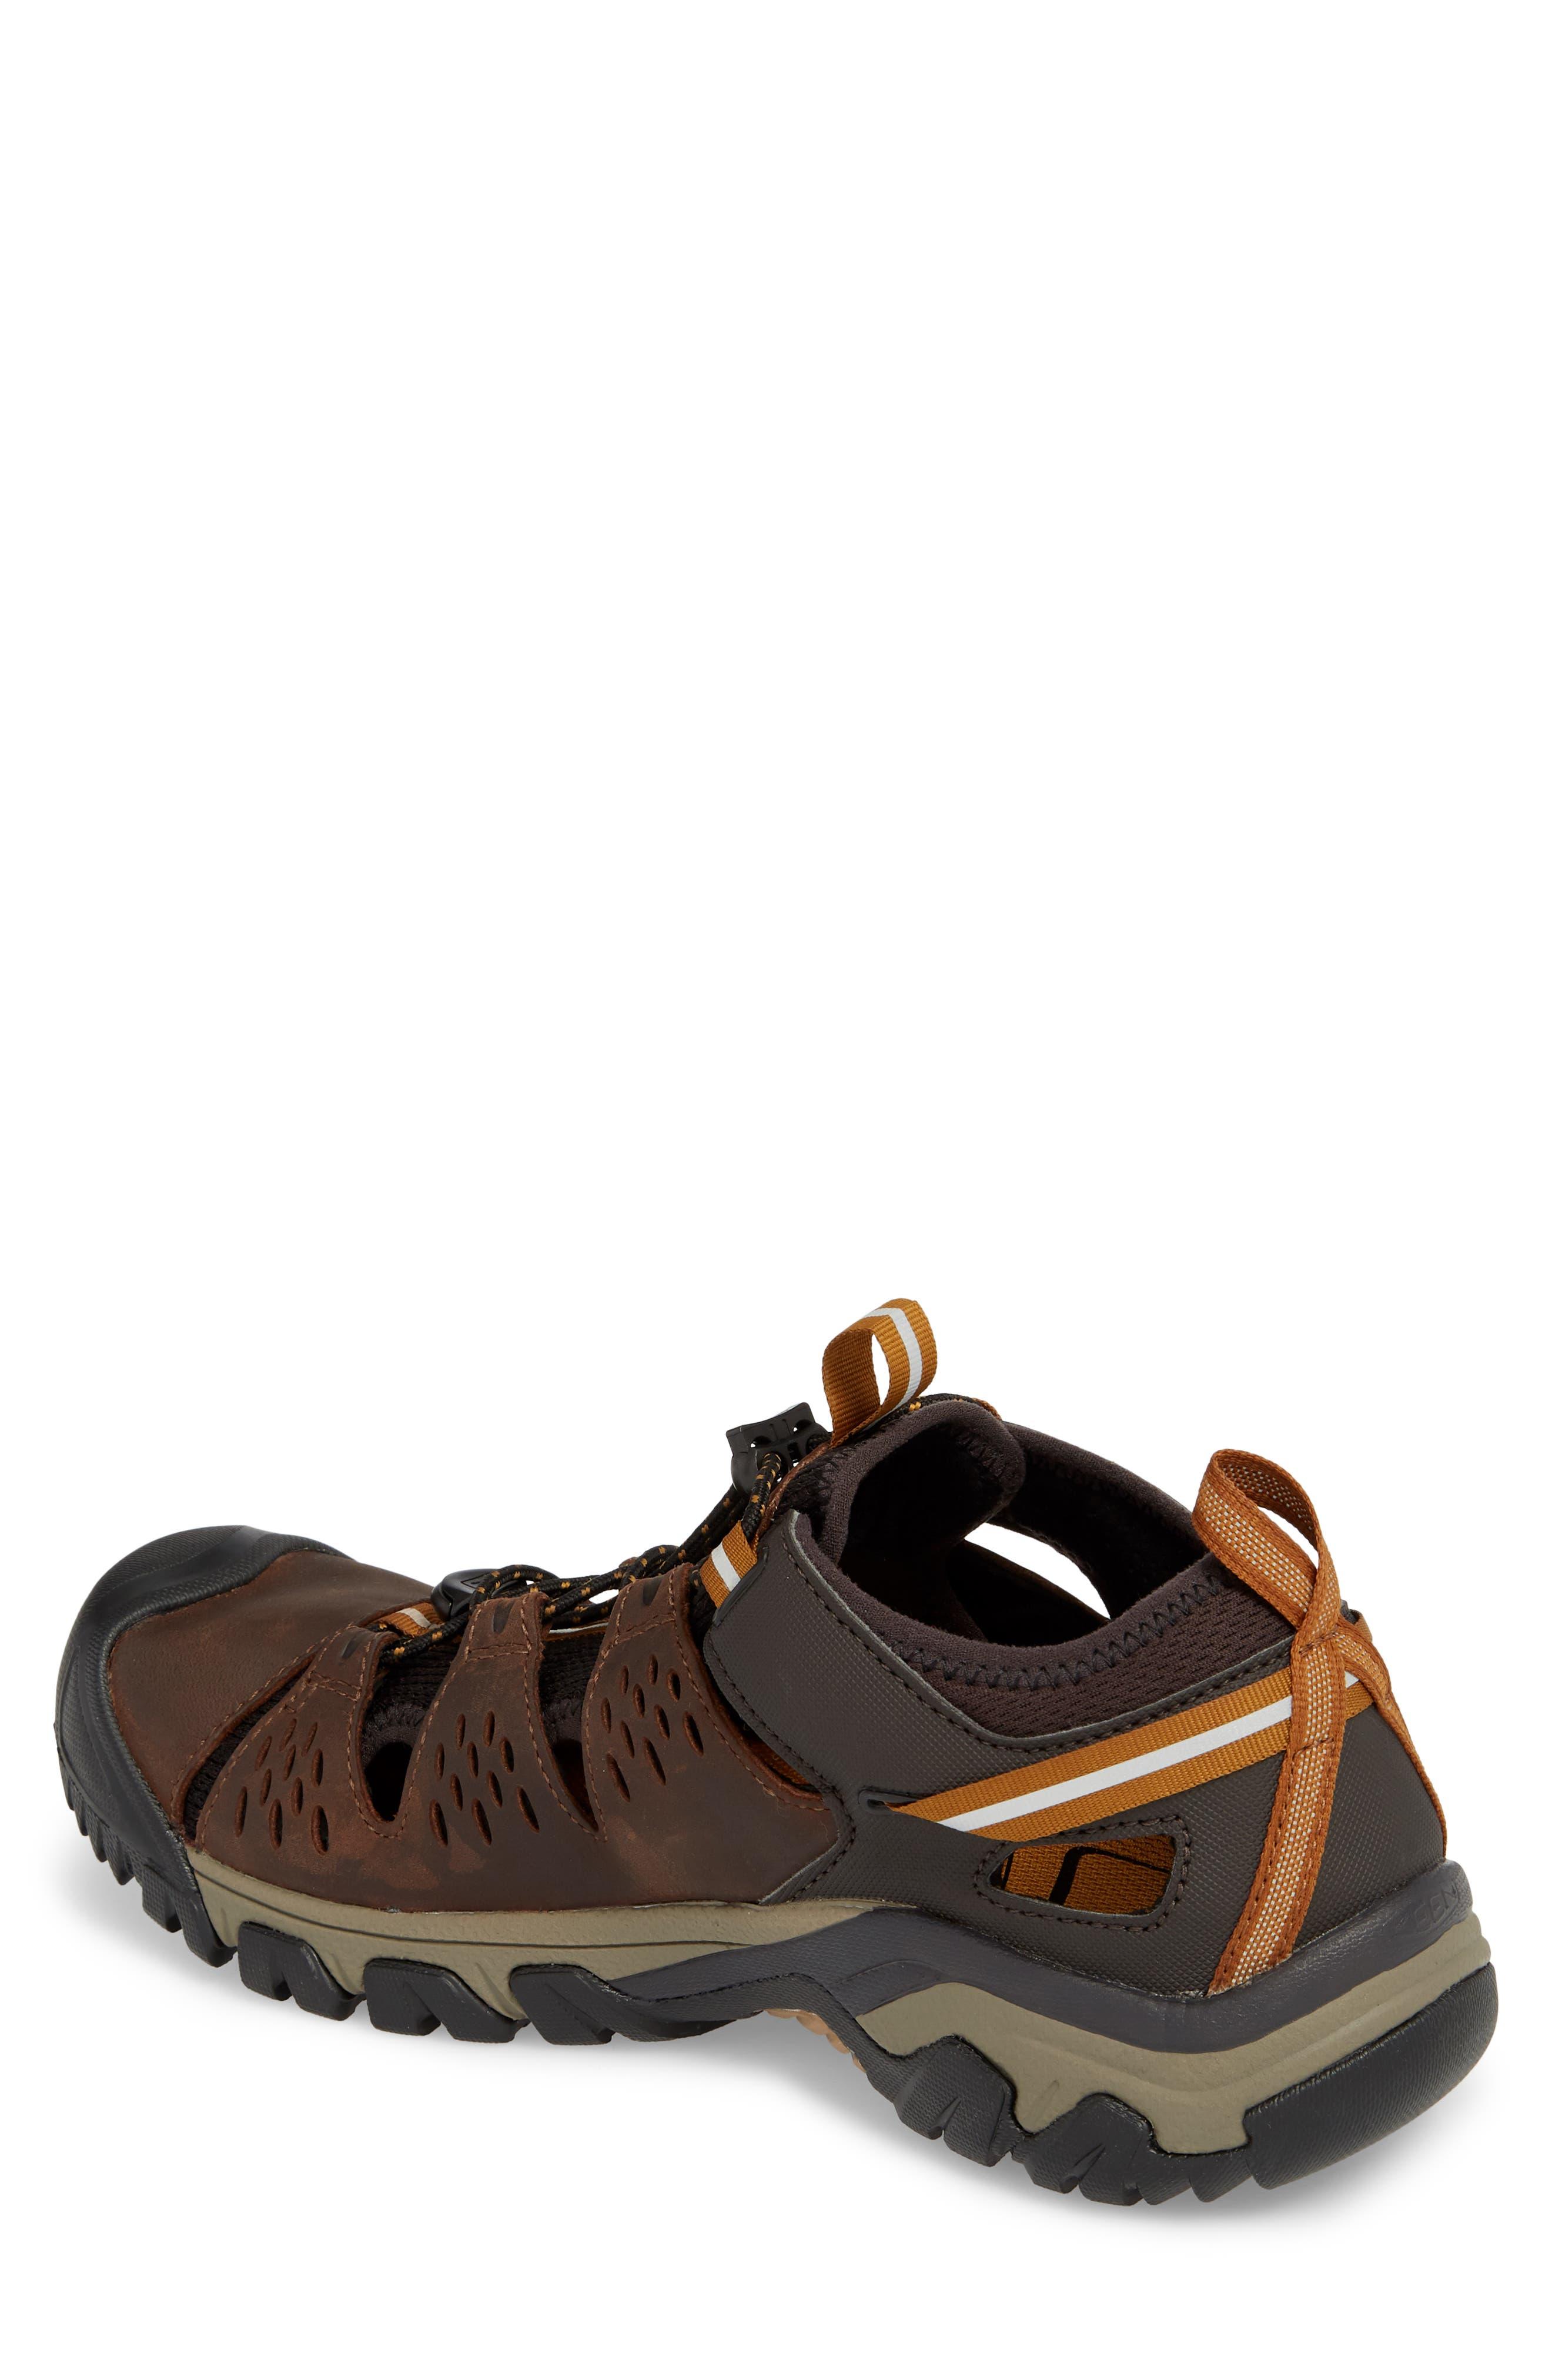 KEEN, Arroyo III Hiking Sandal, Alternate thumbnail 2, color, CUBAN/GOLDEN BROWN